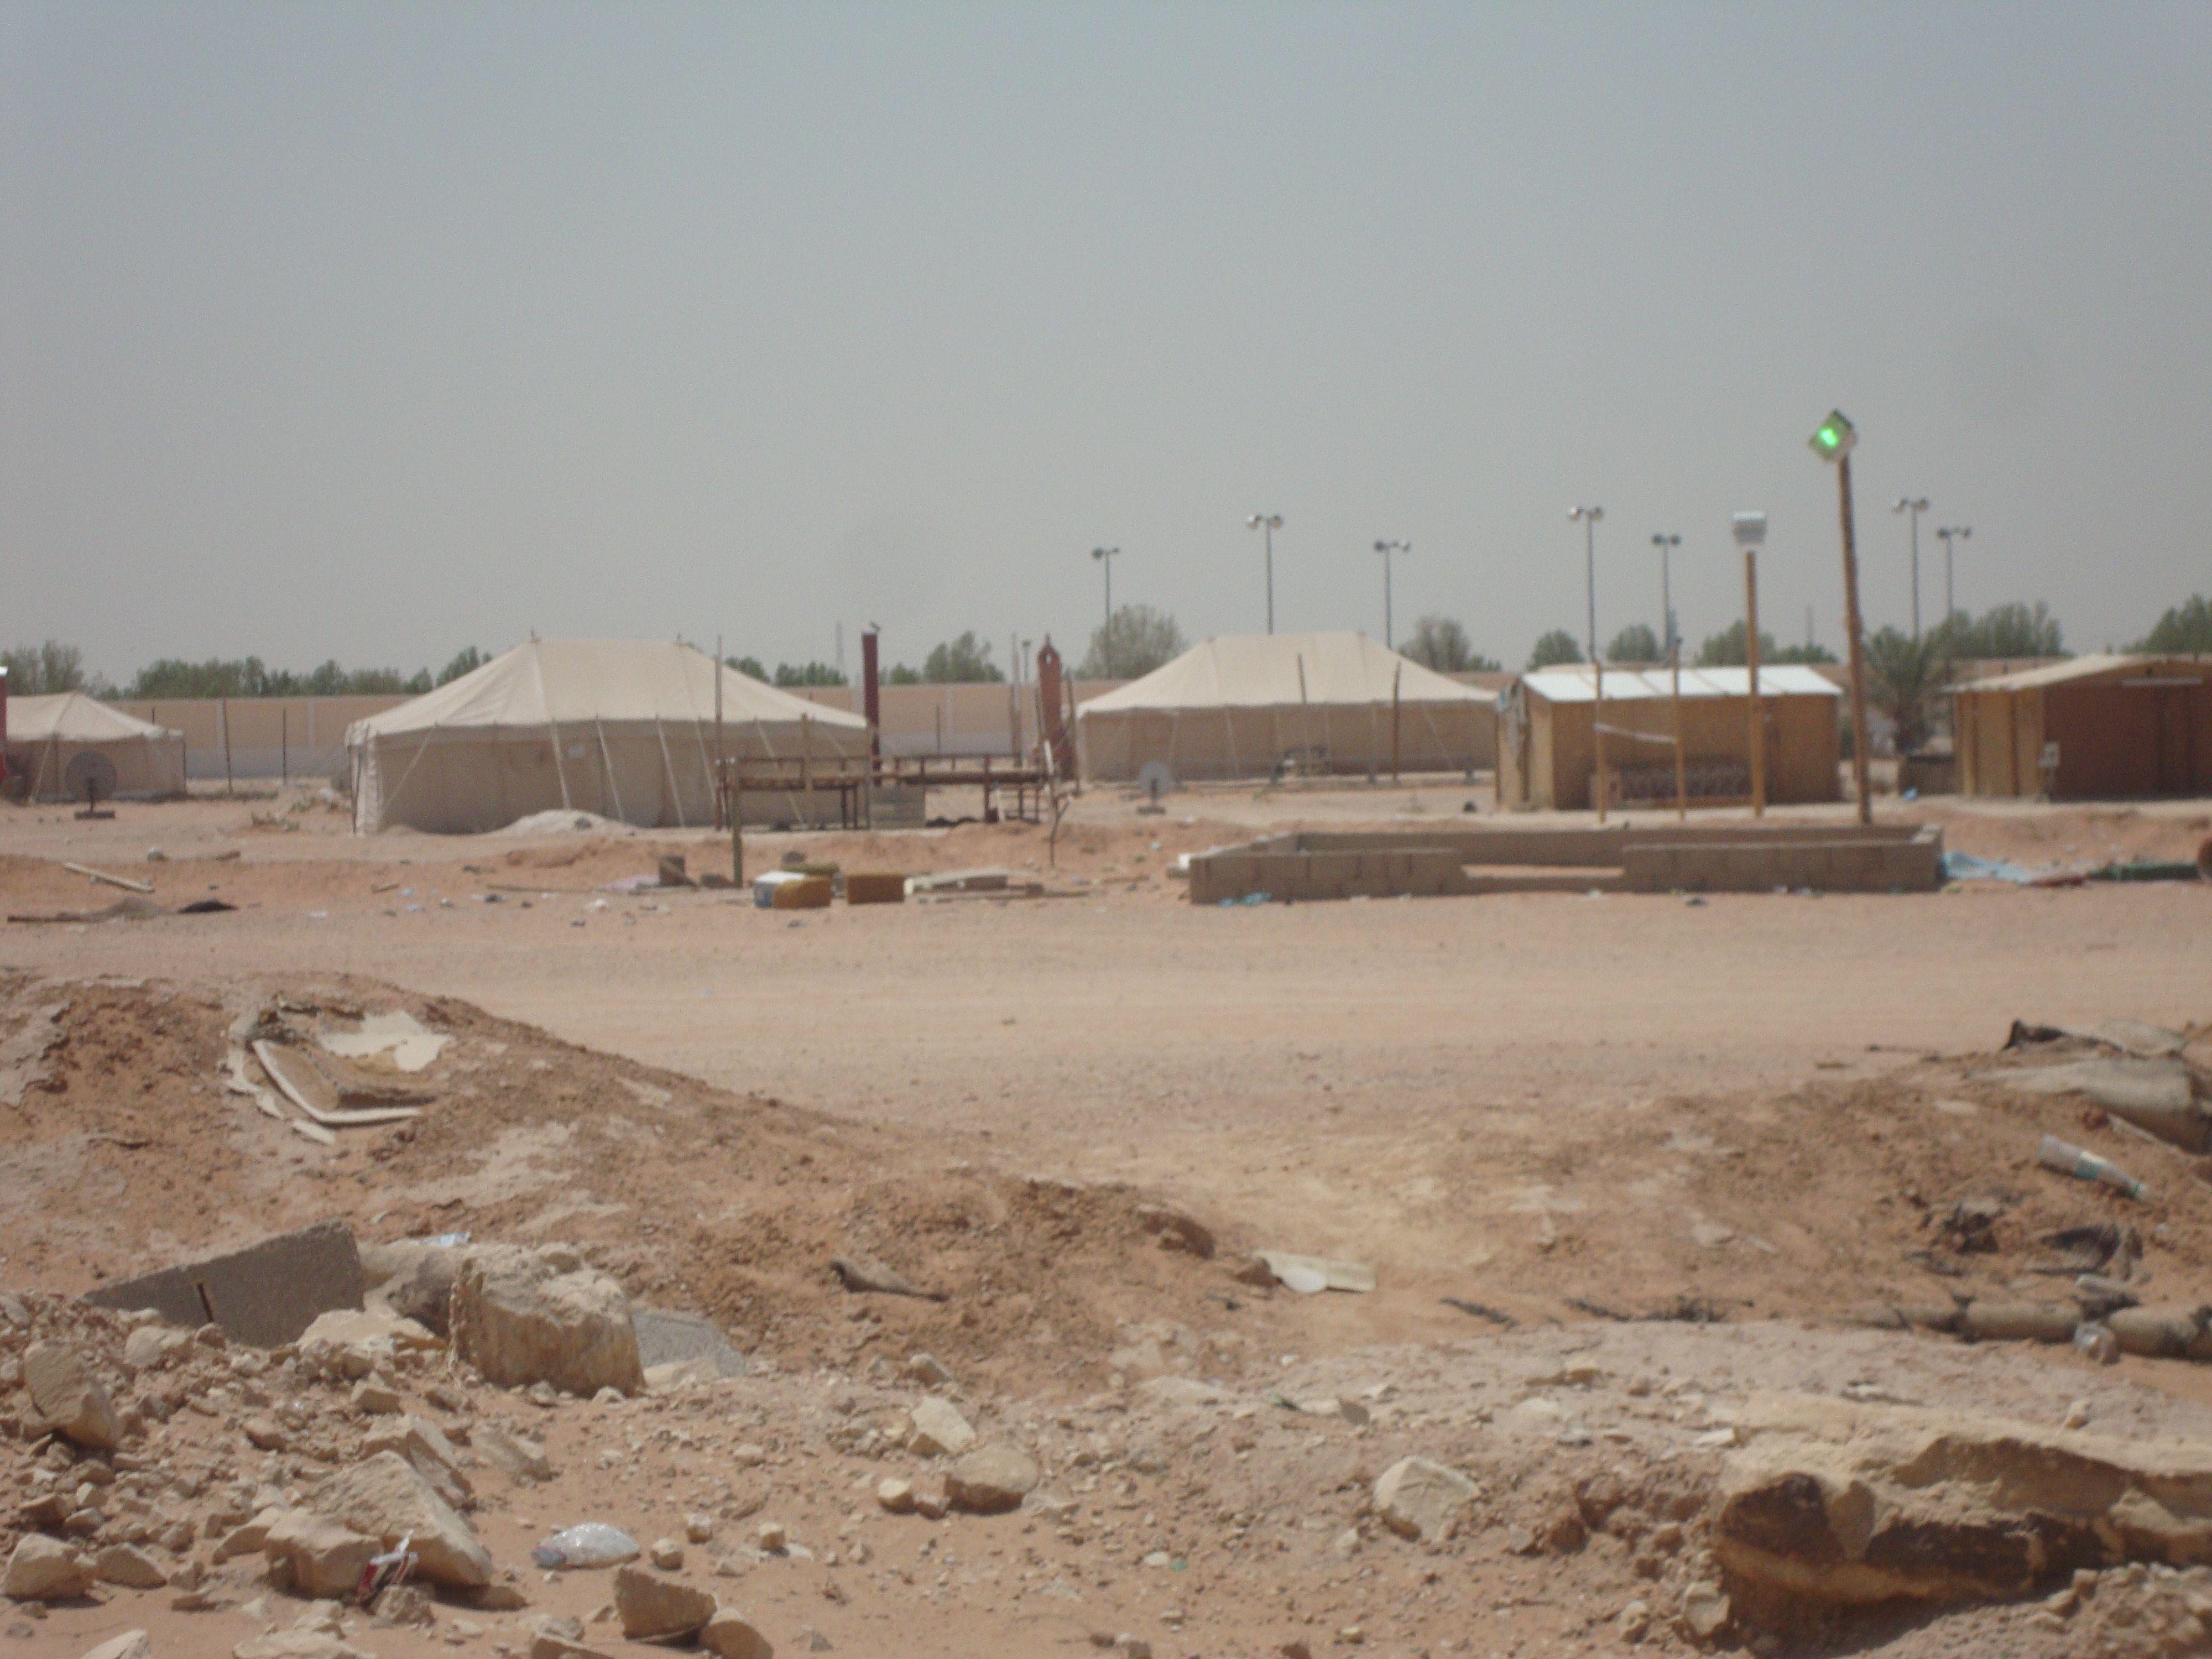 Tents Homes In Riyadh Saudi Arabia Tent Portable Shelter Saudi Arabia